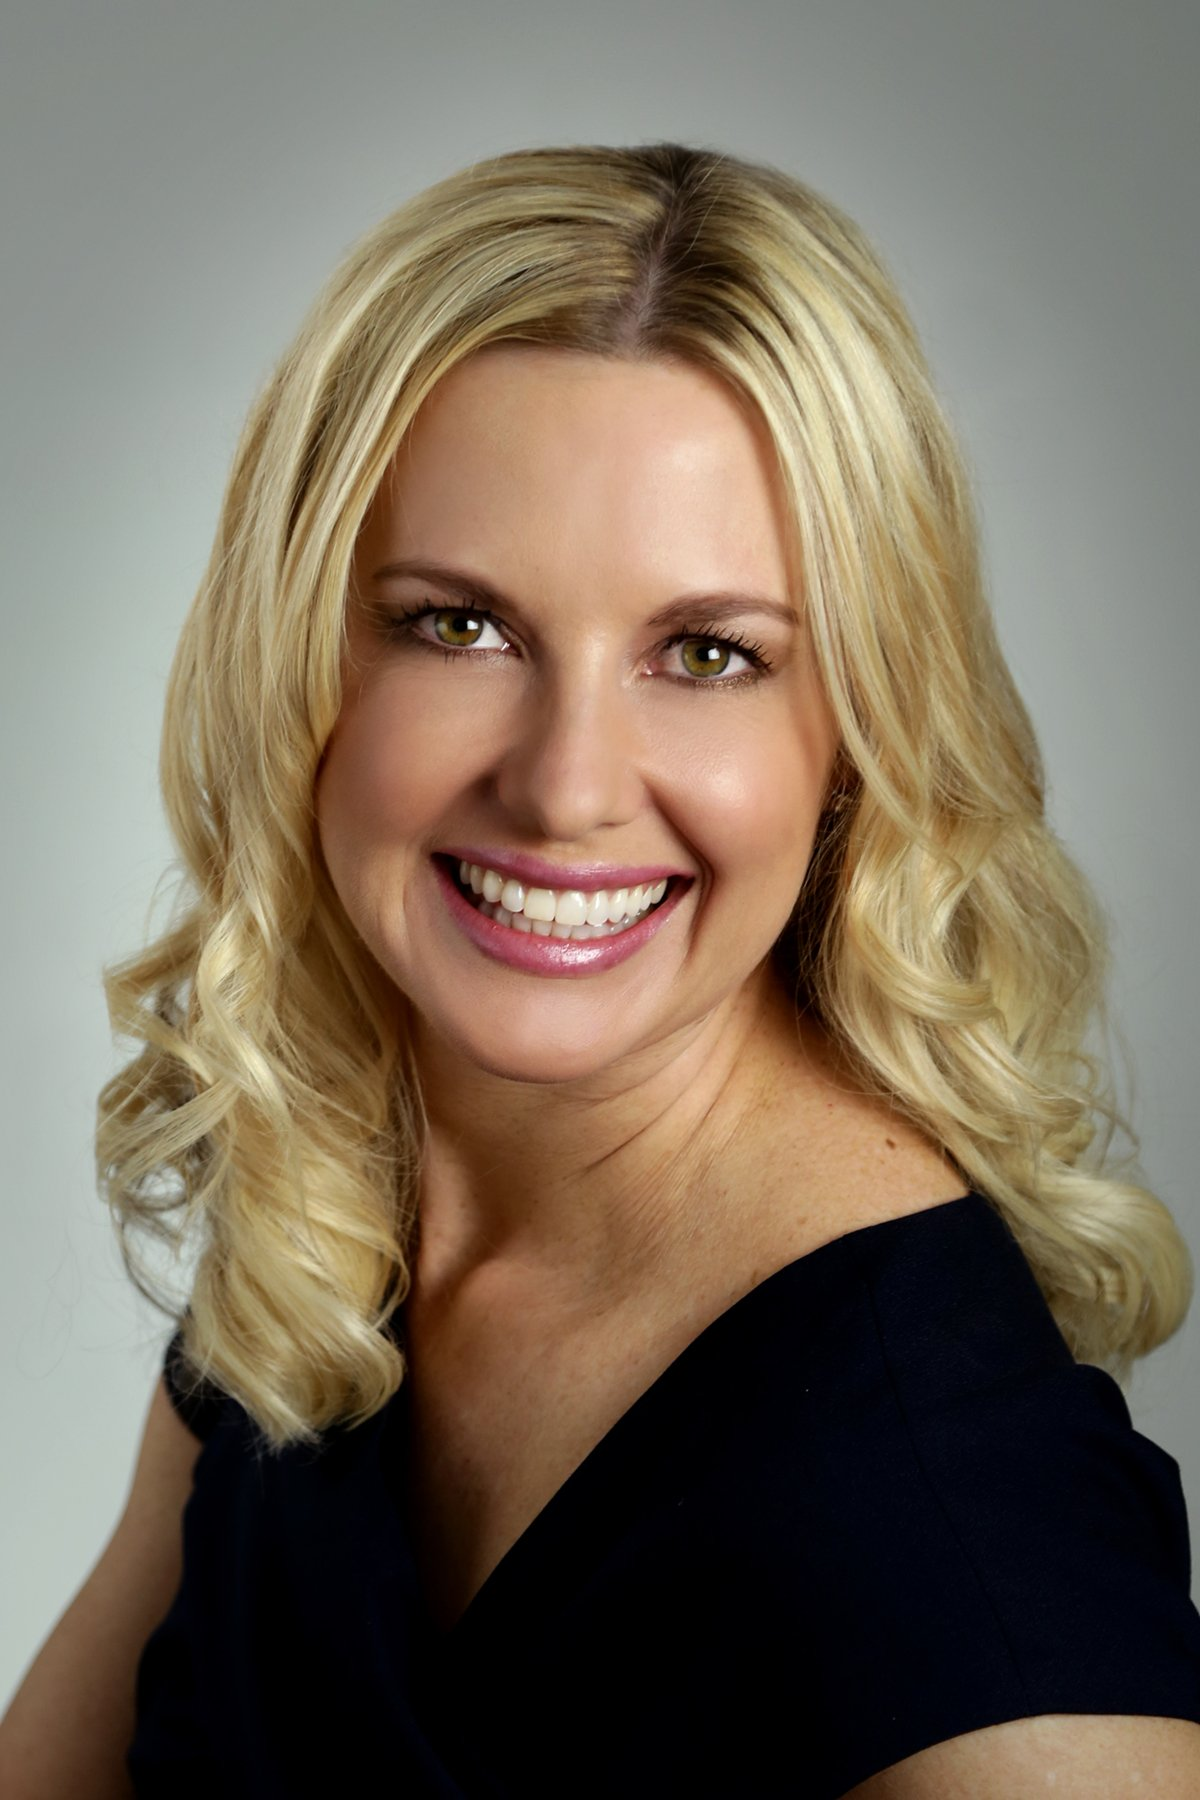 Best Female Plastic Surgeon Dr. Roxanne Grawe